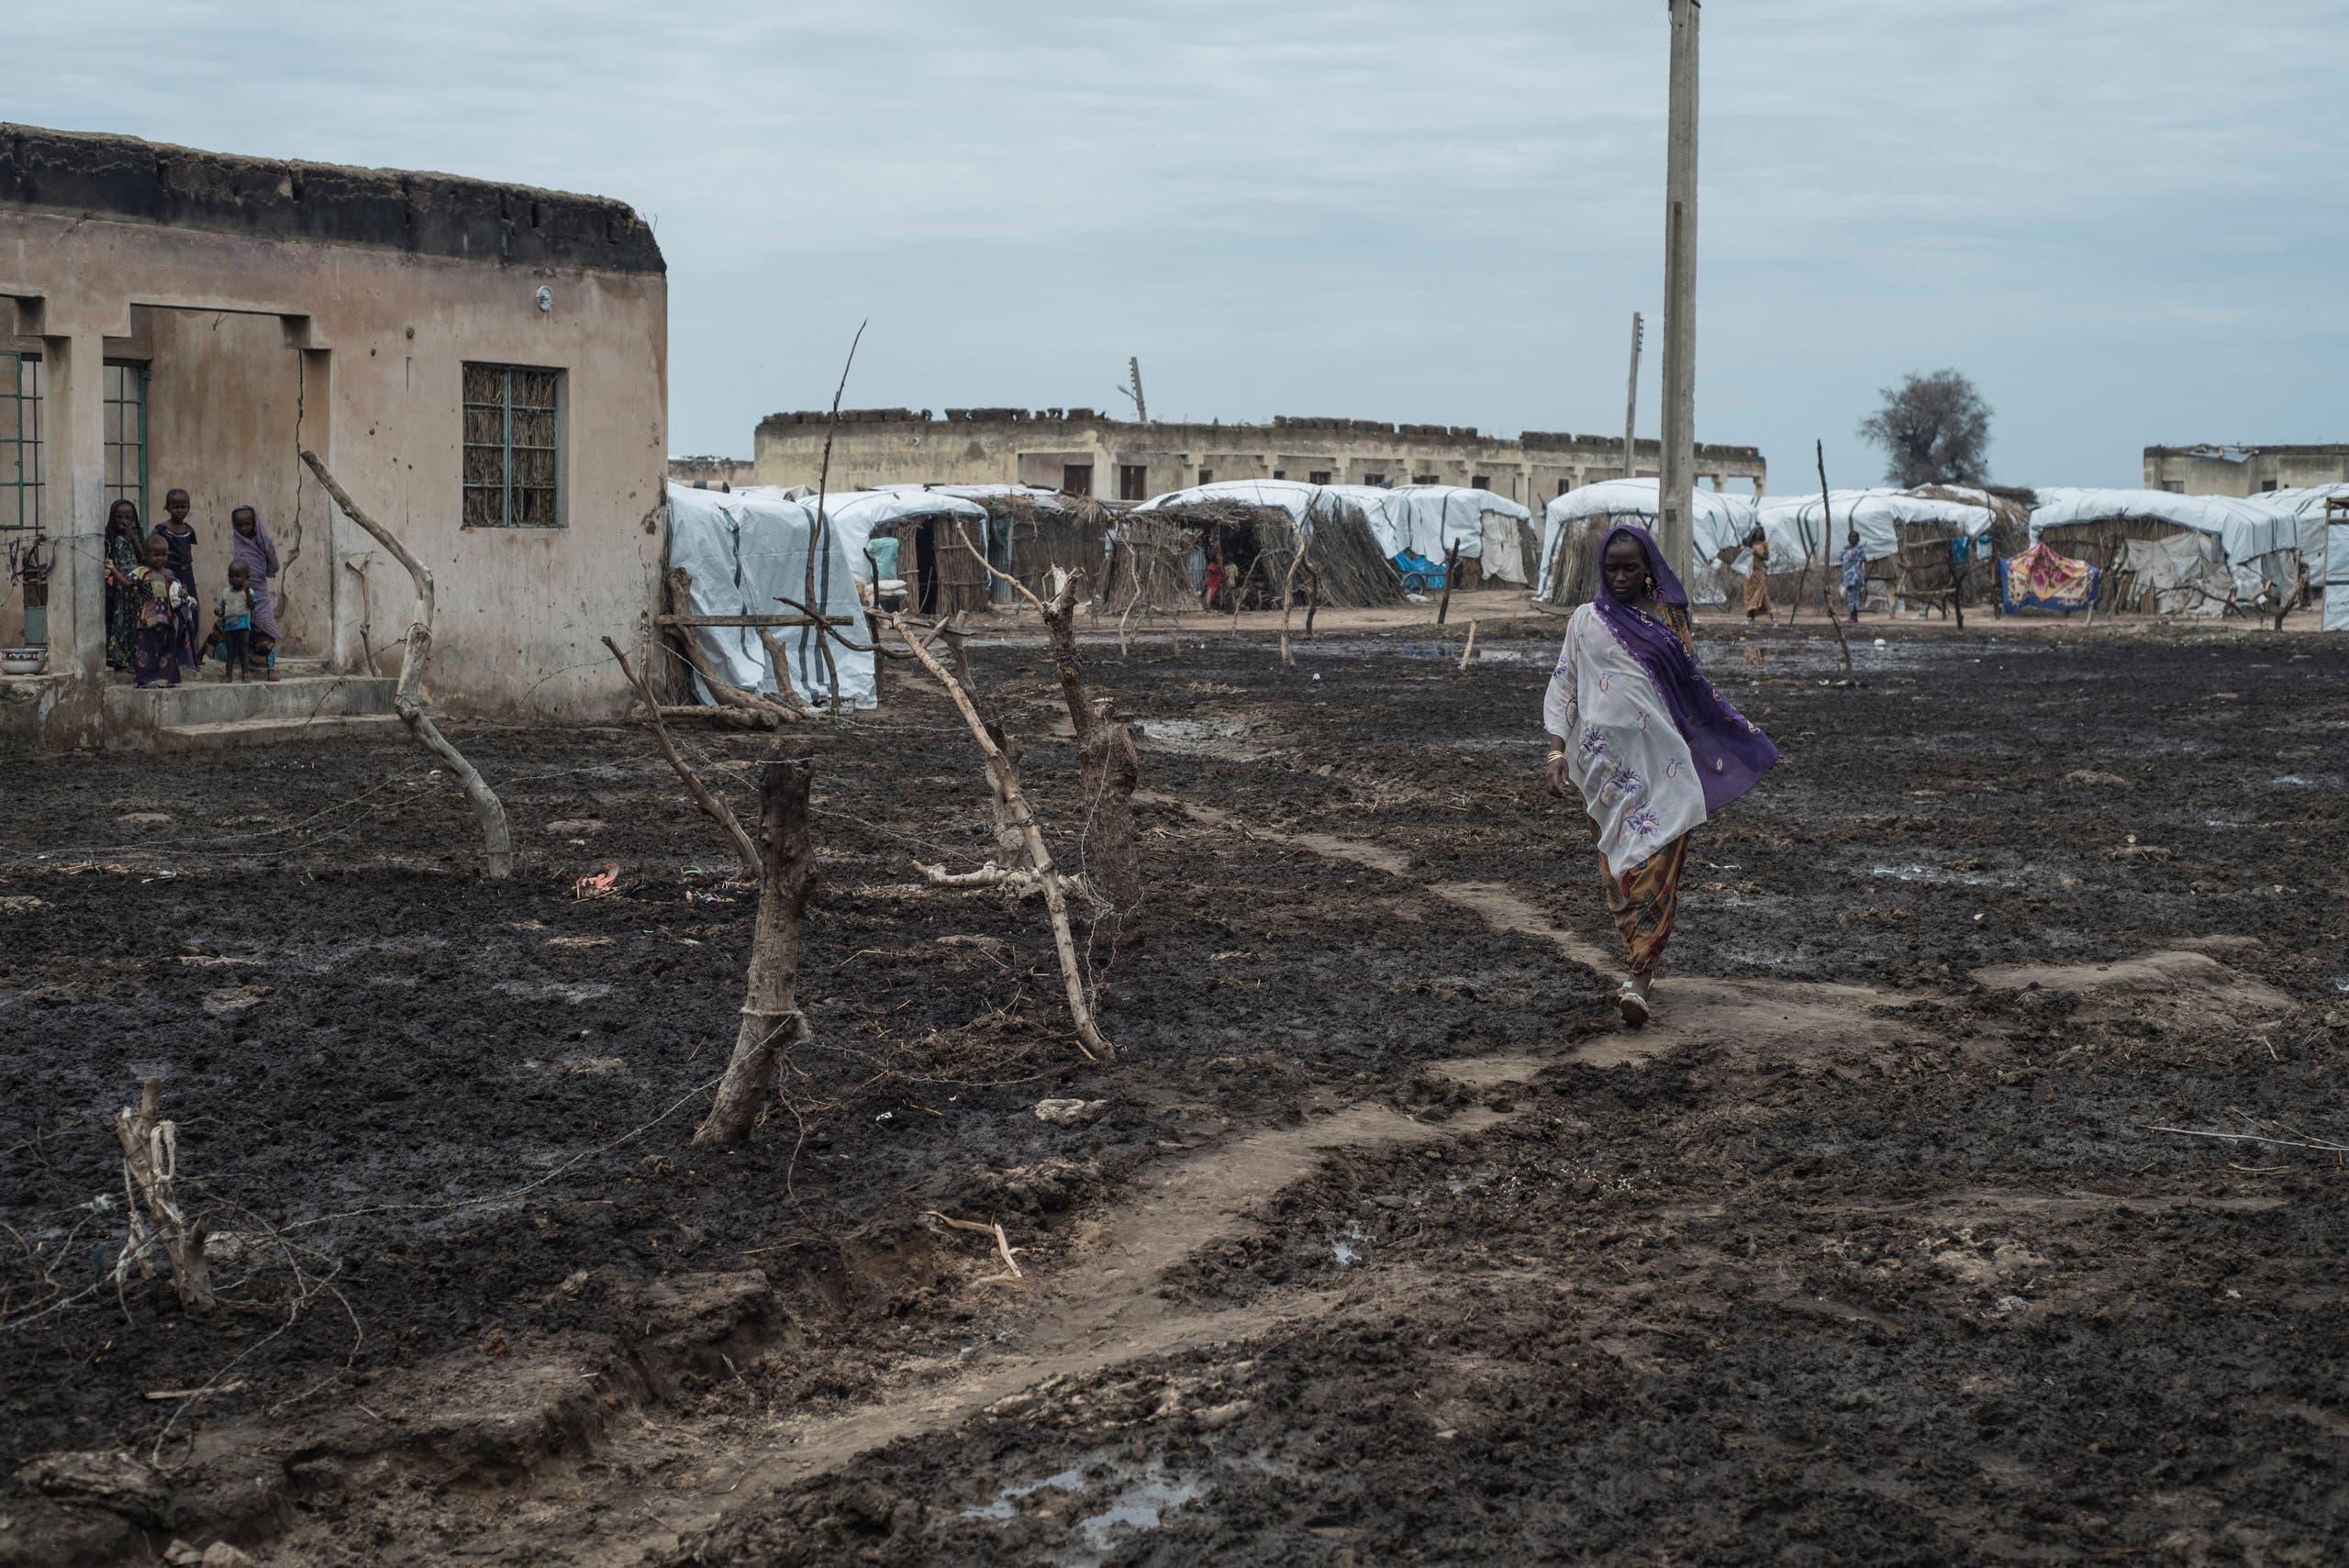 Isis strikes in Nigeria kills 17 people, including a humanitarian worker